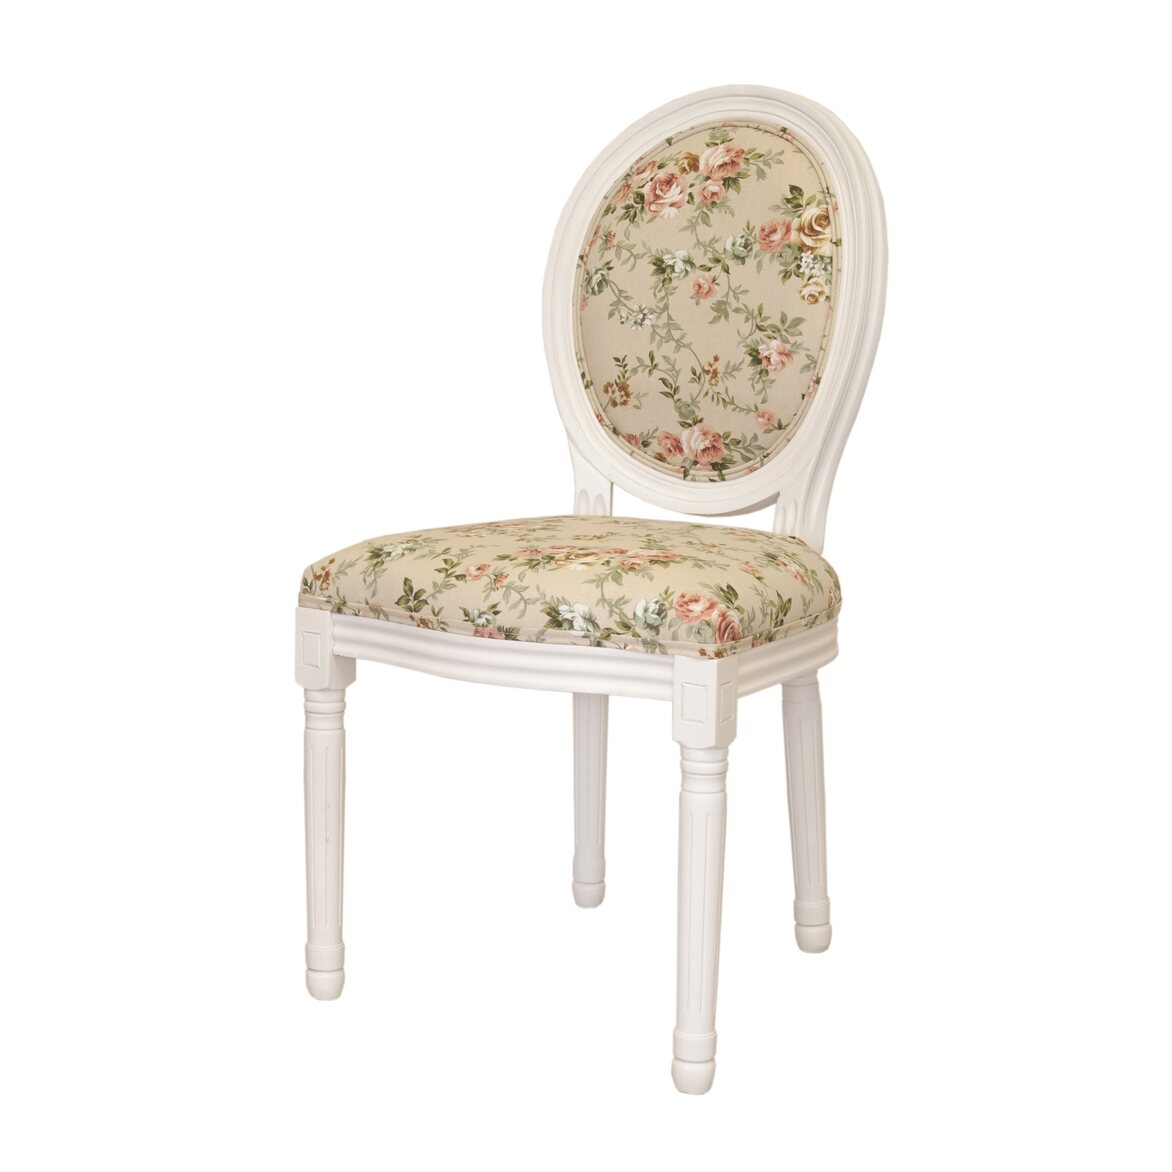 Стул Volker flower 4 | Обеденные стулья Kingsby